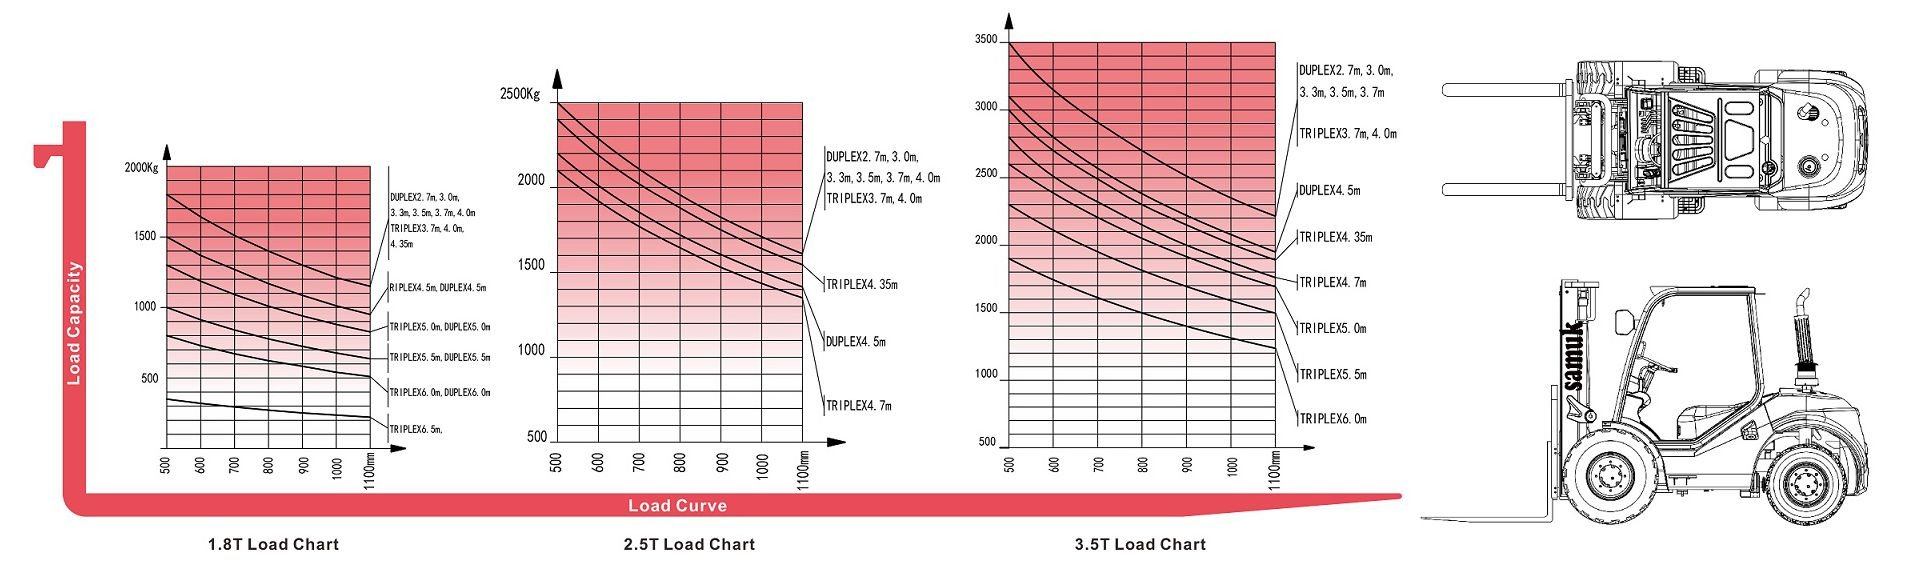 Load chart_2WD_1.8 - 3.5 T